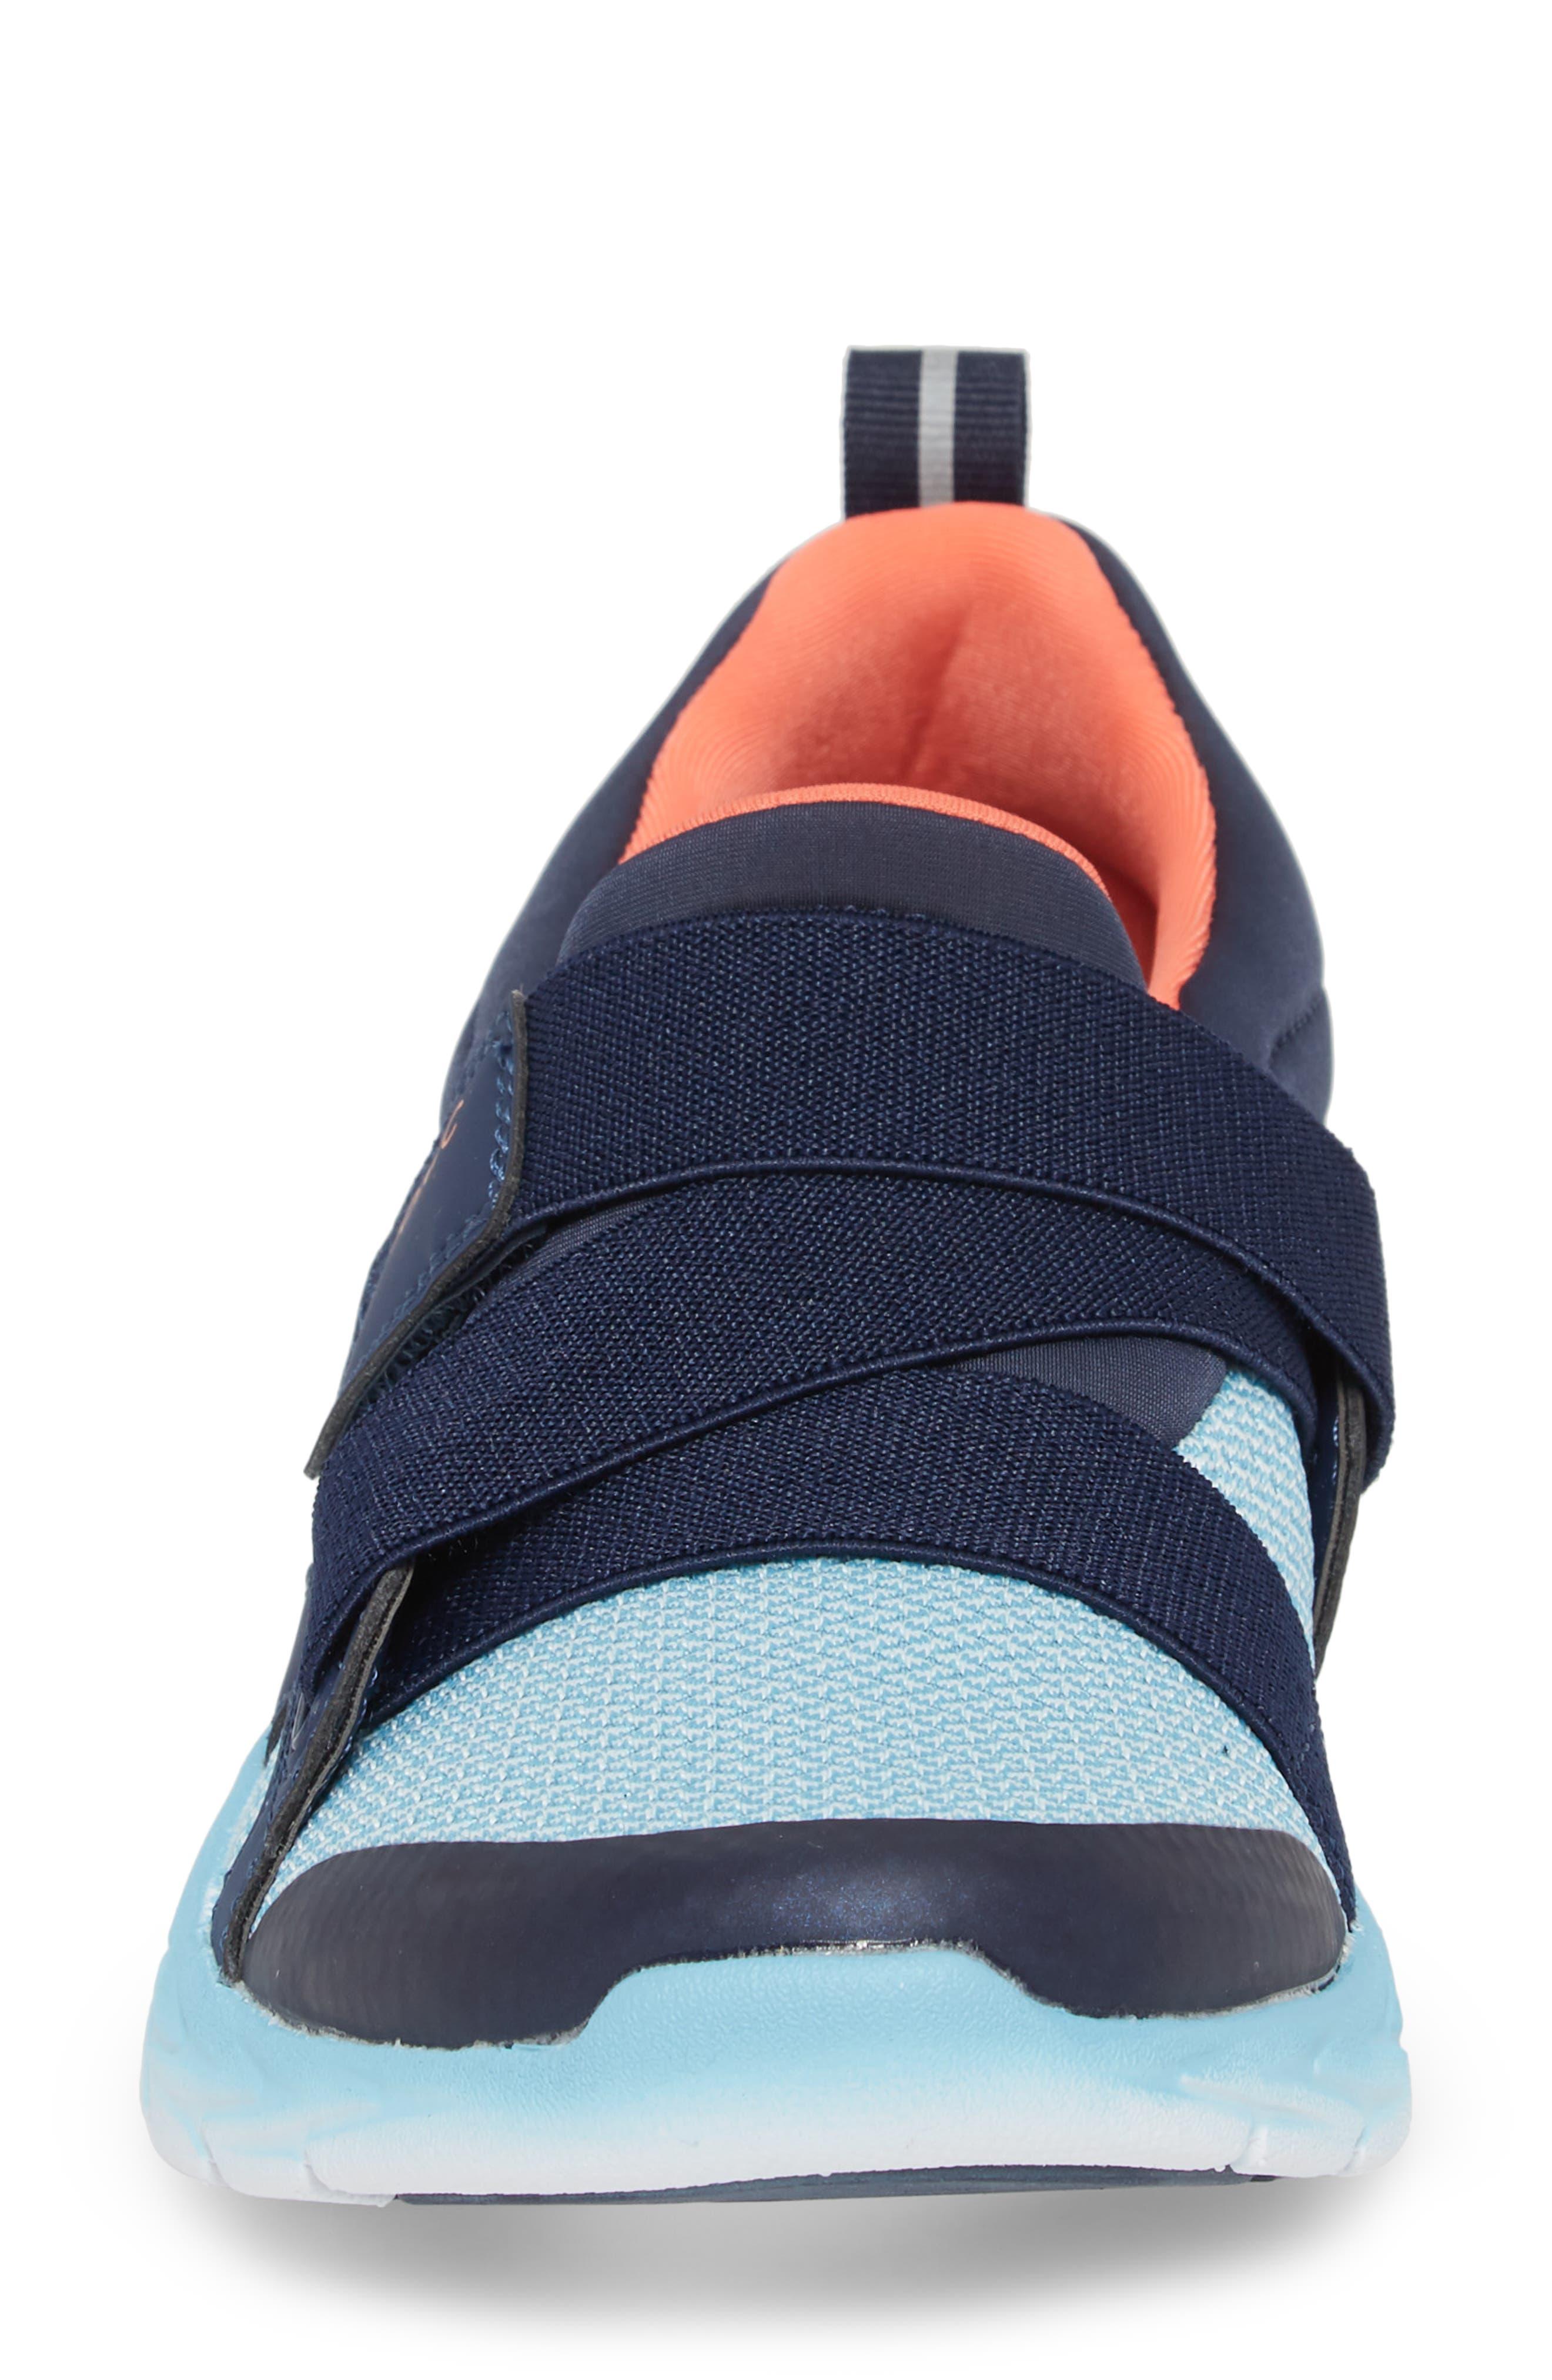 Dash Sneaker,                             Alternate thumbnail 4, color,                             Navy/ Light Blue Fabric